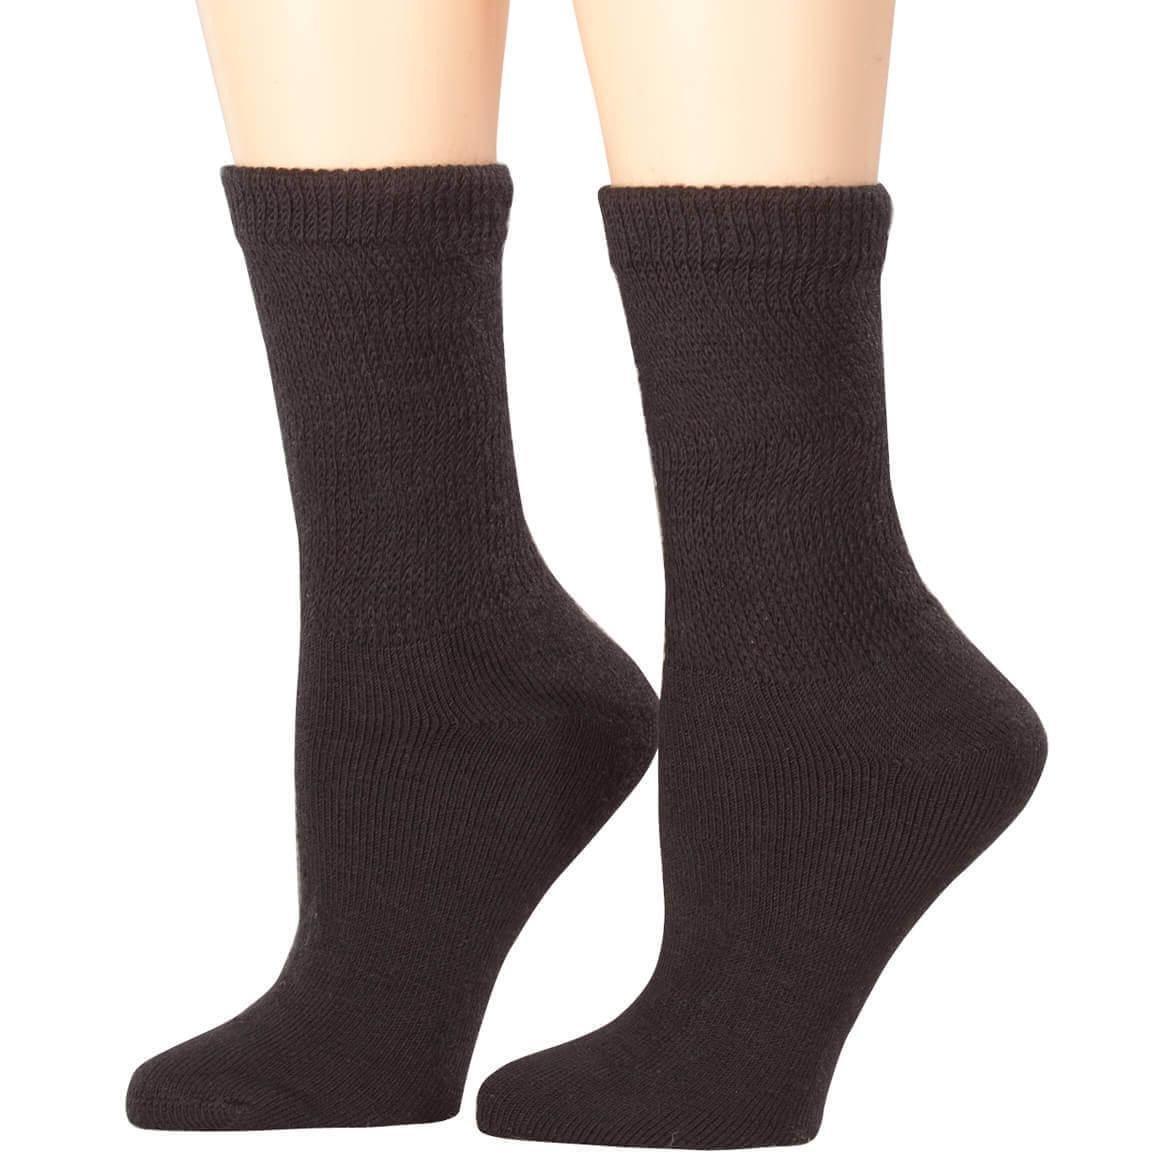 Healthy Steps Extra Plush Socks - Diabetic Socks - Miles Kimball